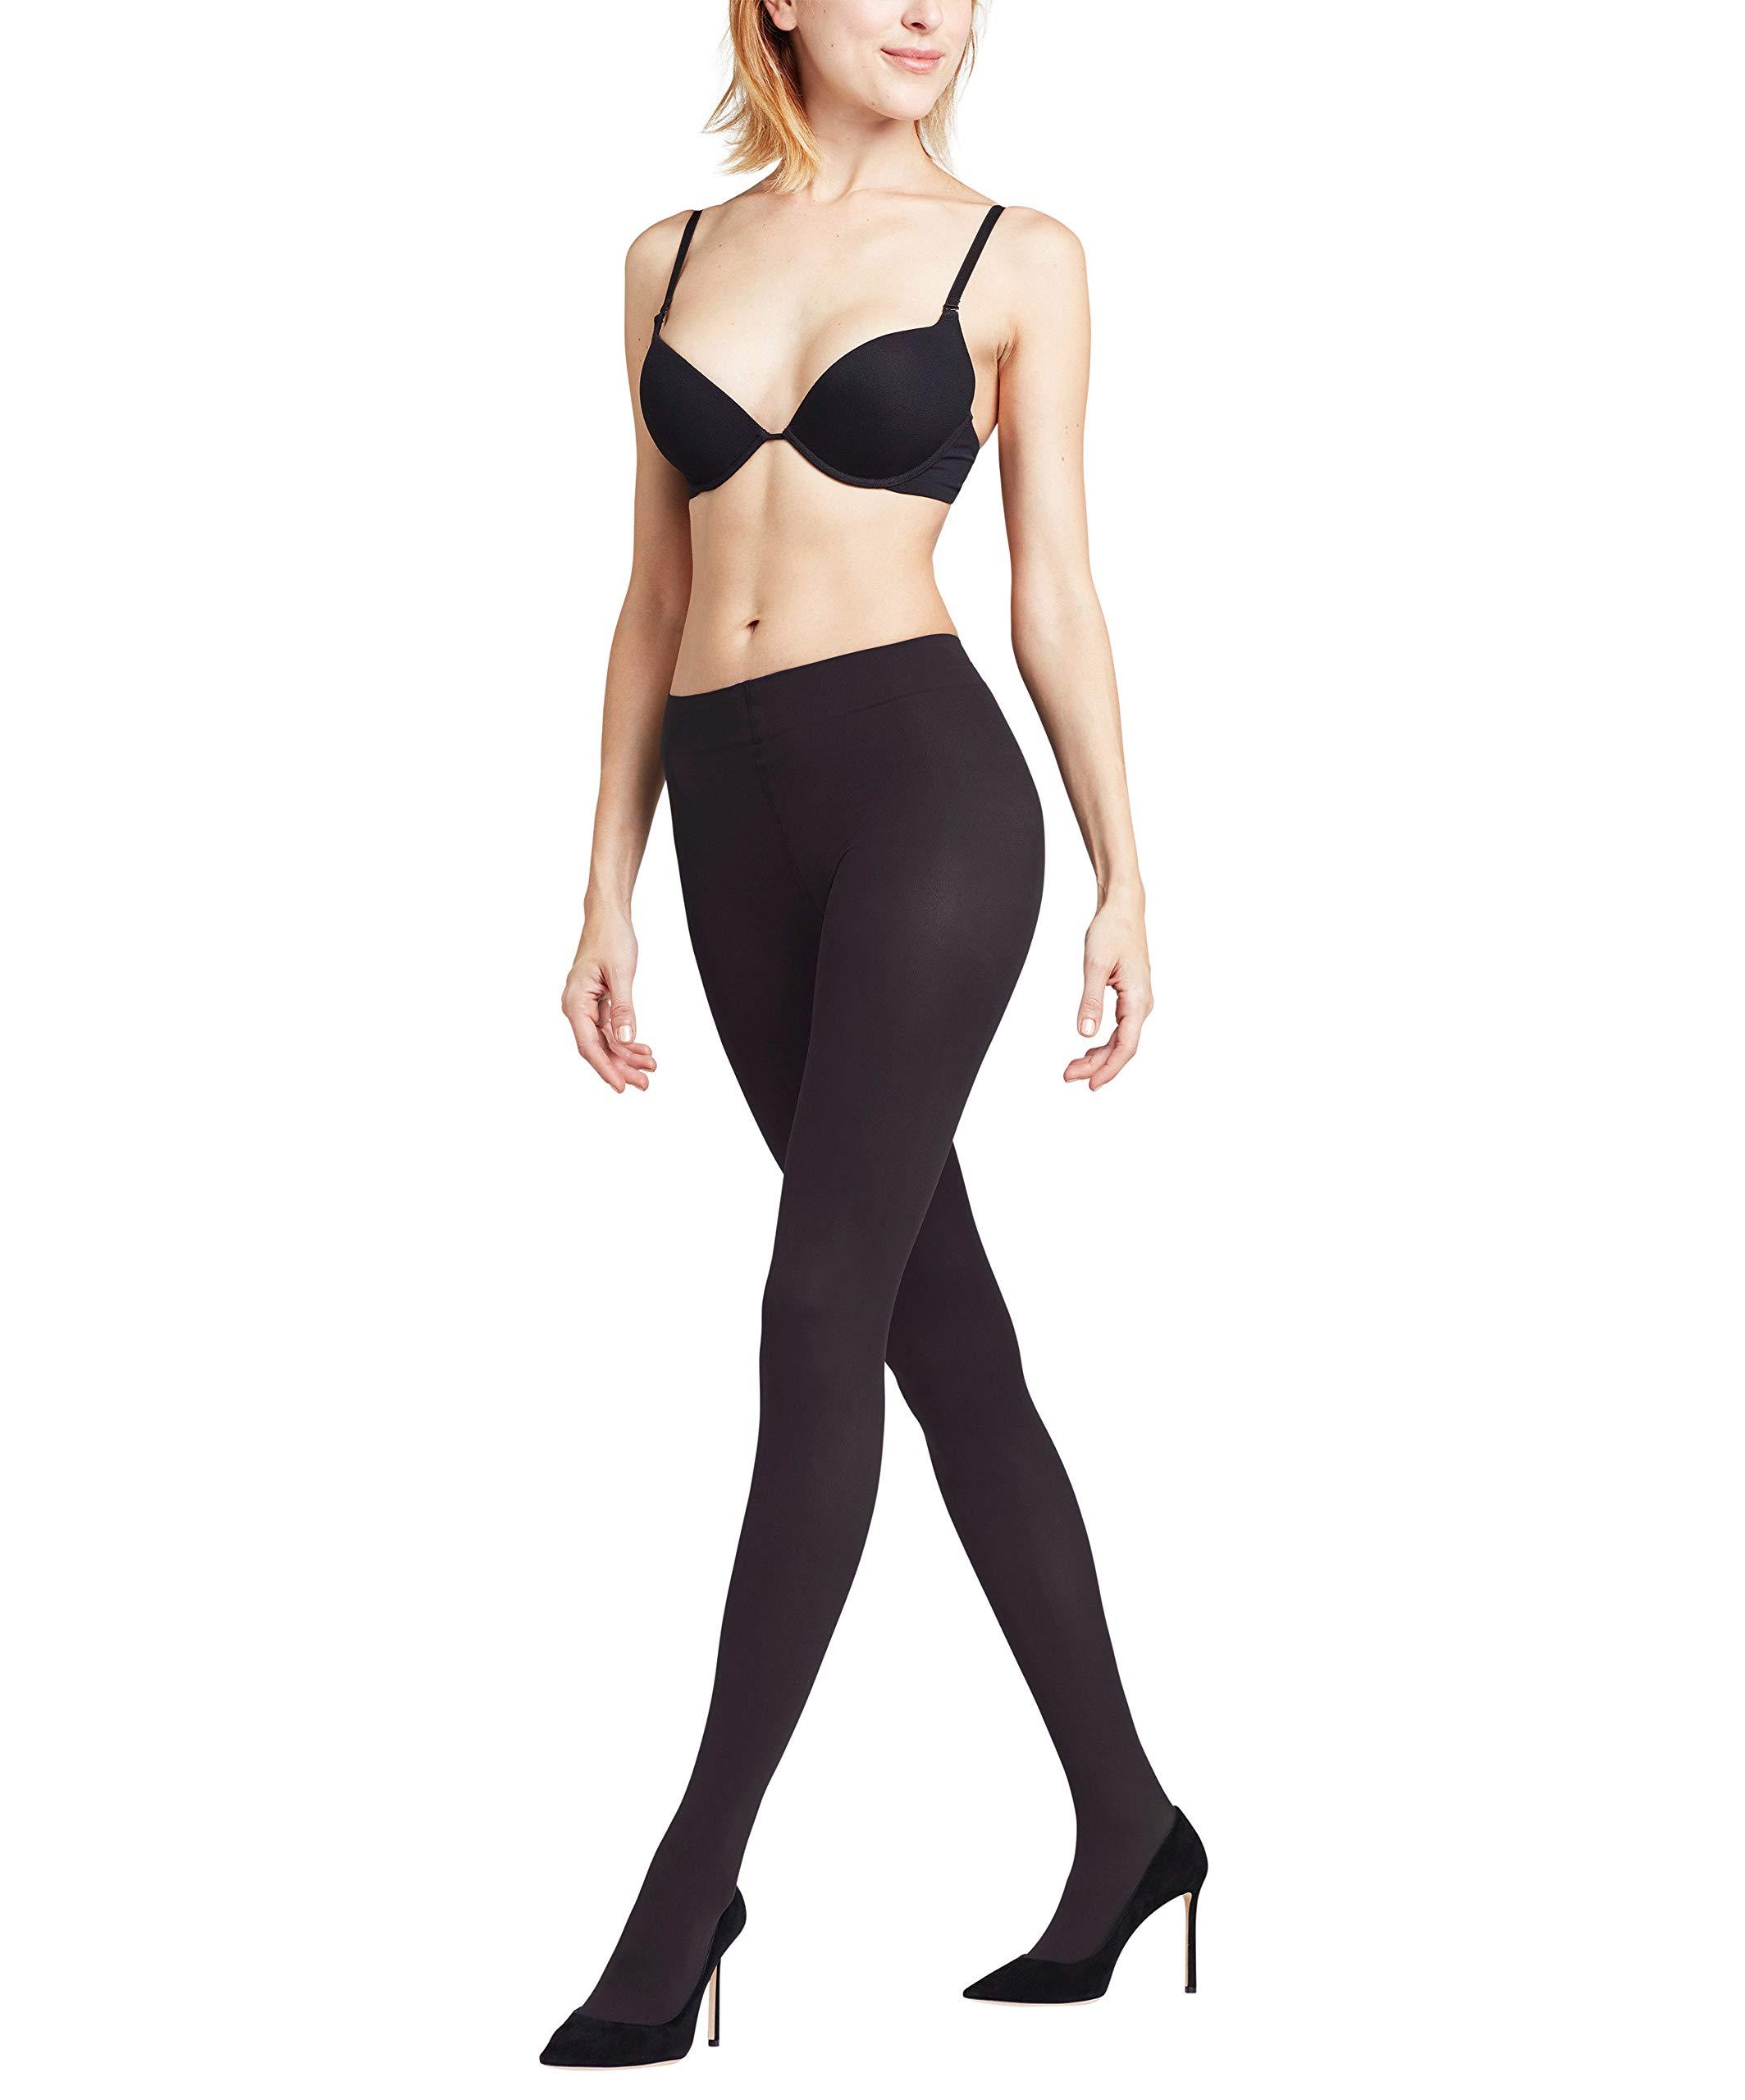 FALKE Womens Pure Matt 50 DEN Tights - Semi-Opaque, Matt, Multiple Colors, S to XL, 1 Pair